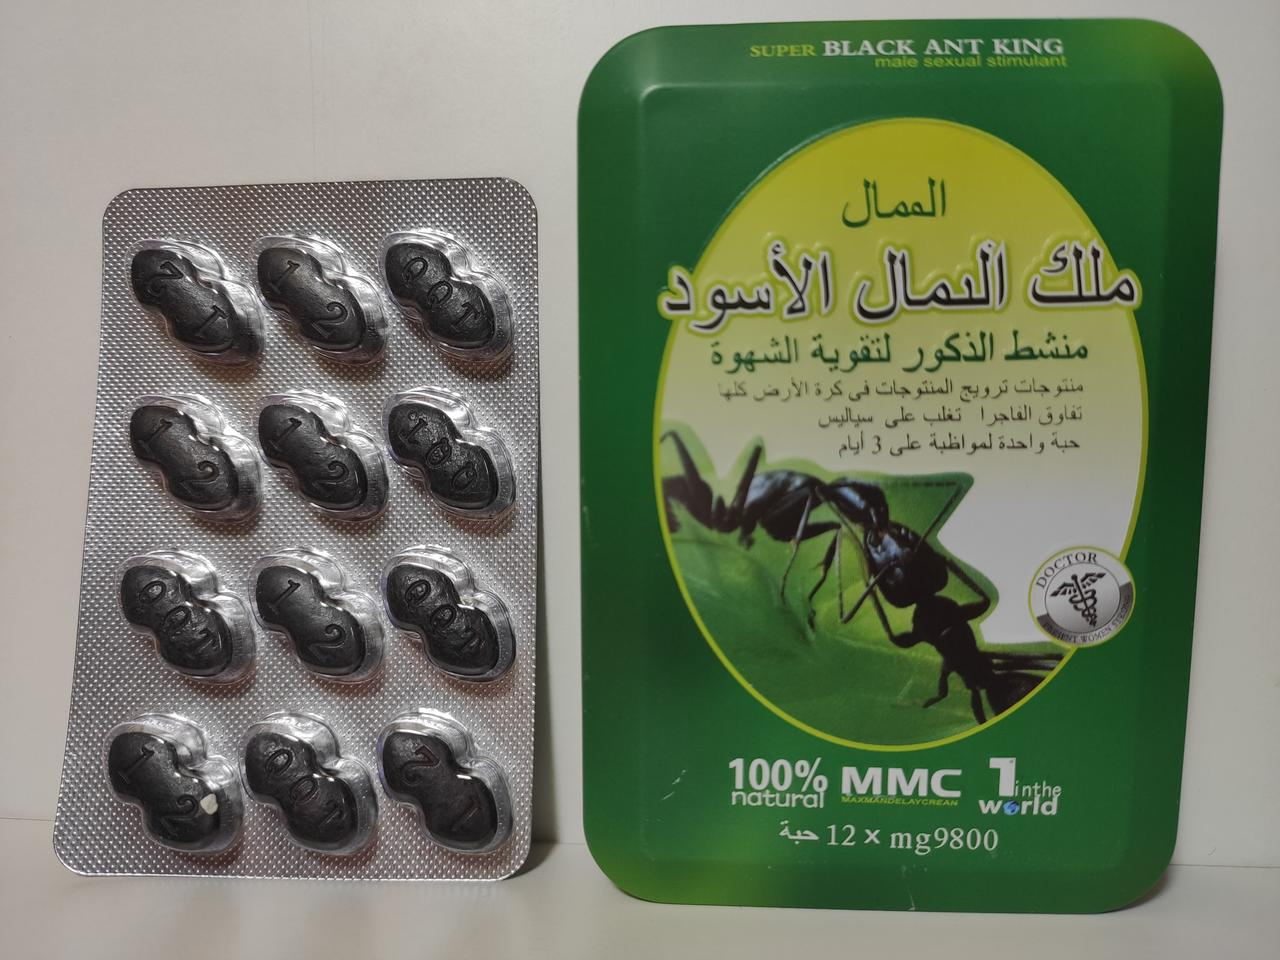 Черный Муравей таблетки для потенции (12 таблеток)